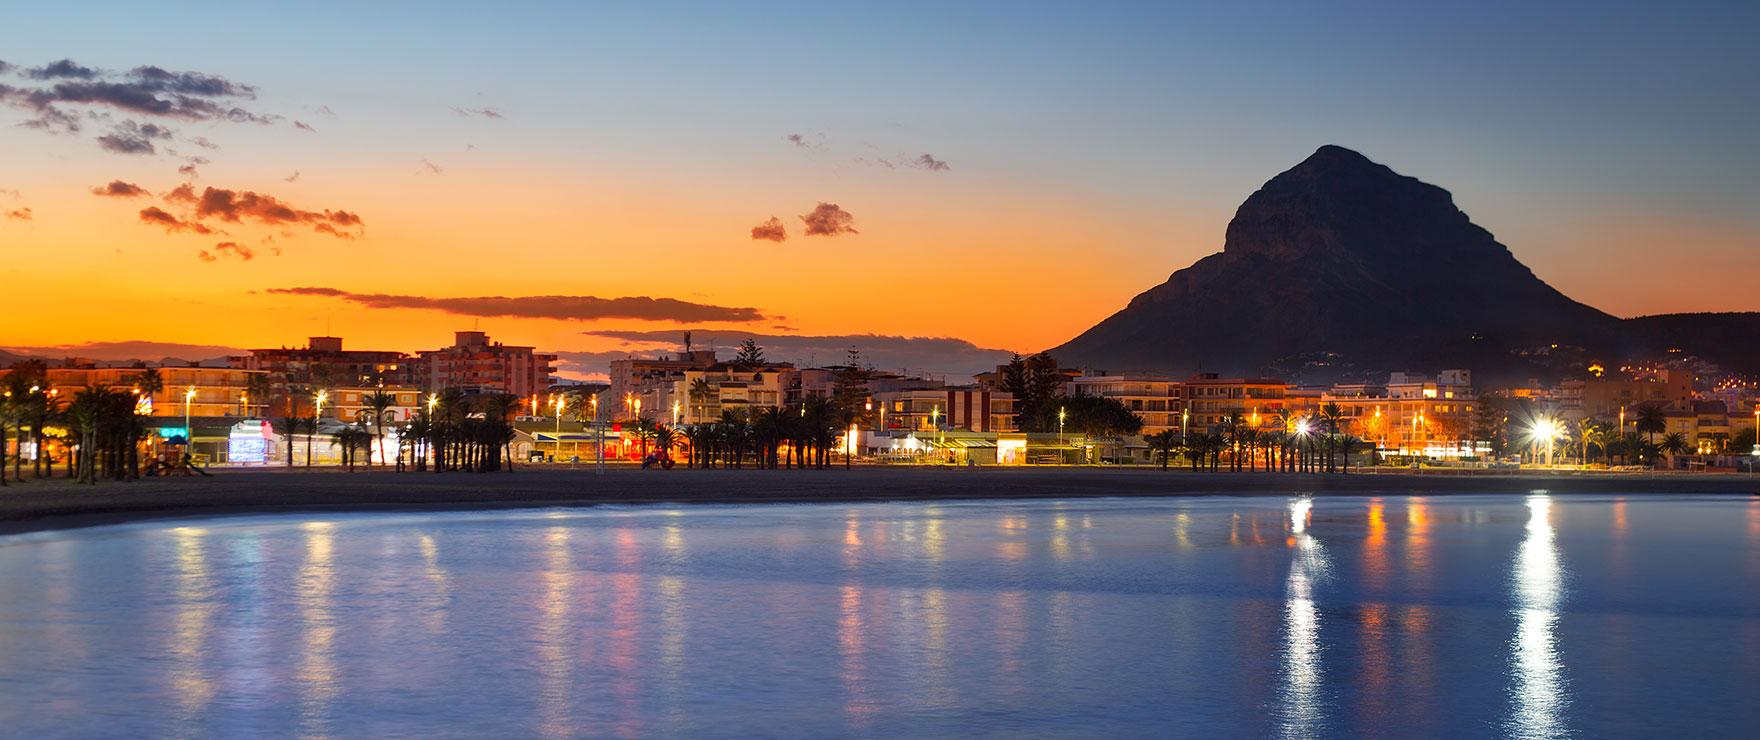 Arenal Dream - Javea (Alicante)